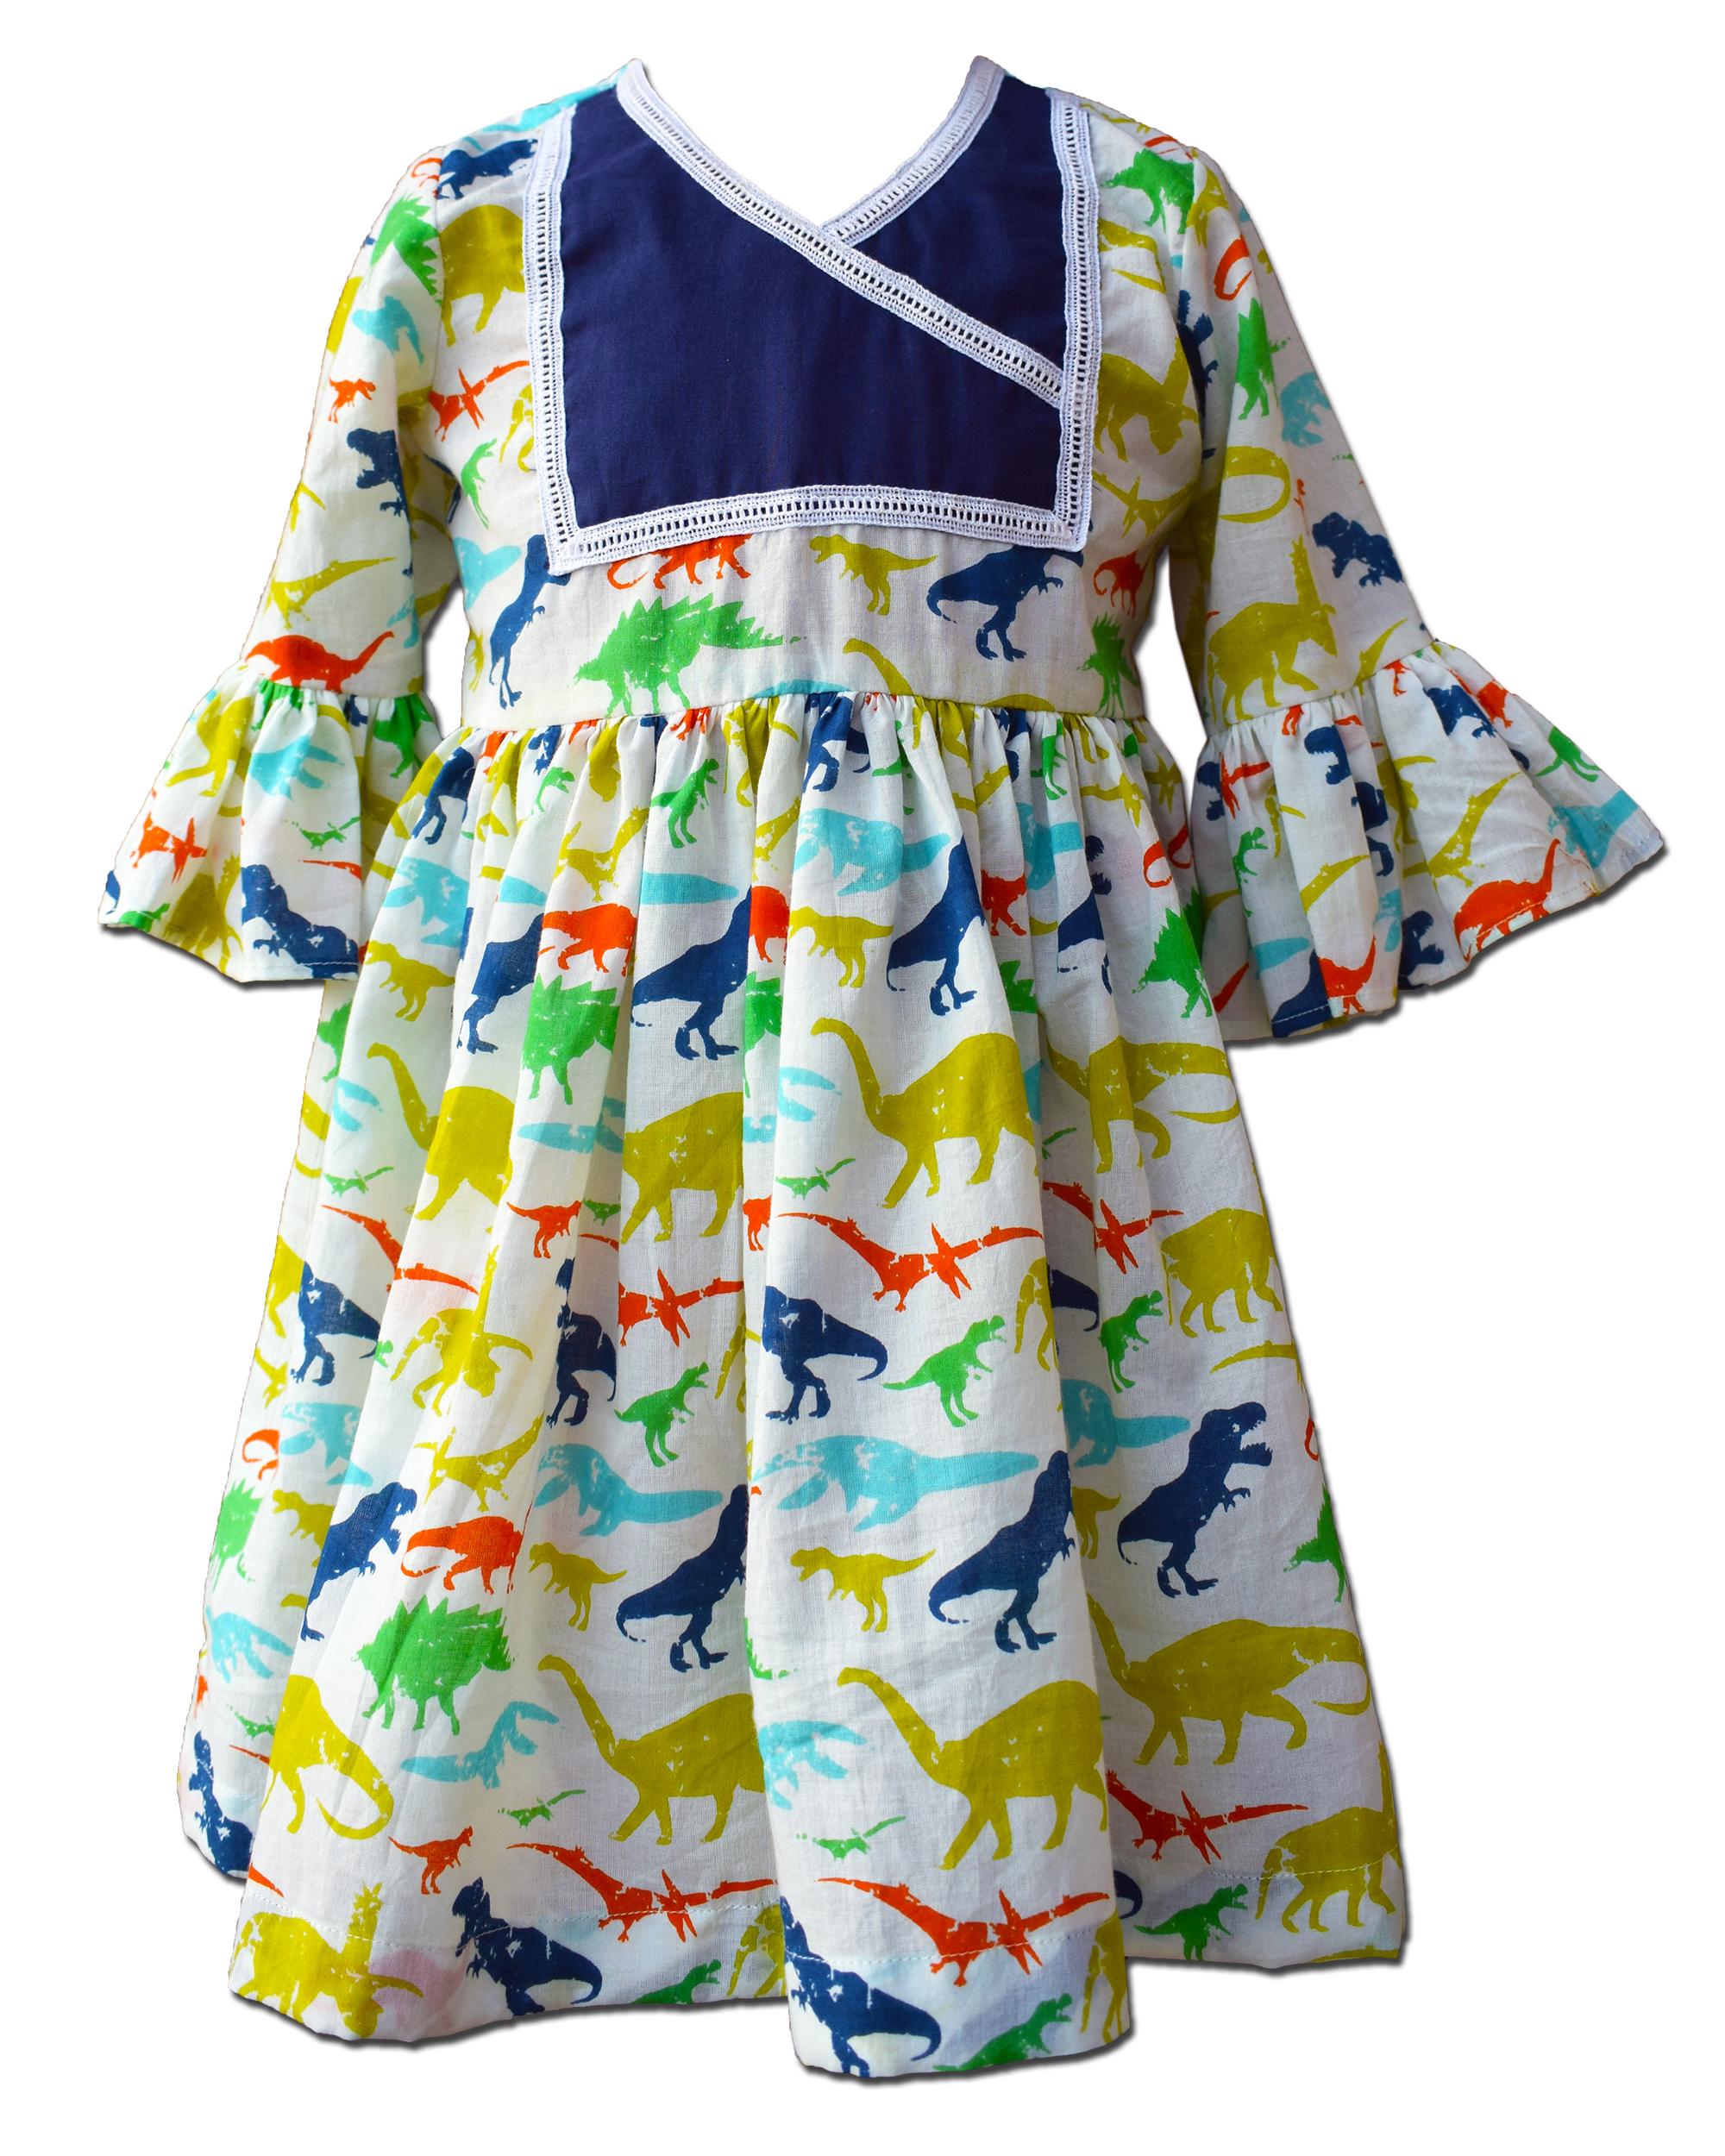 Dinosaur printed ruffled dress